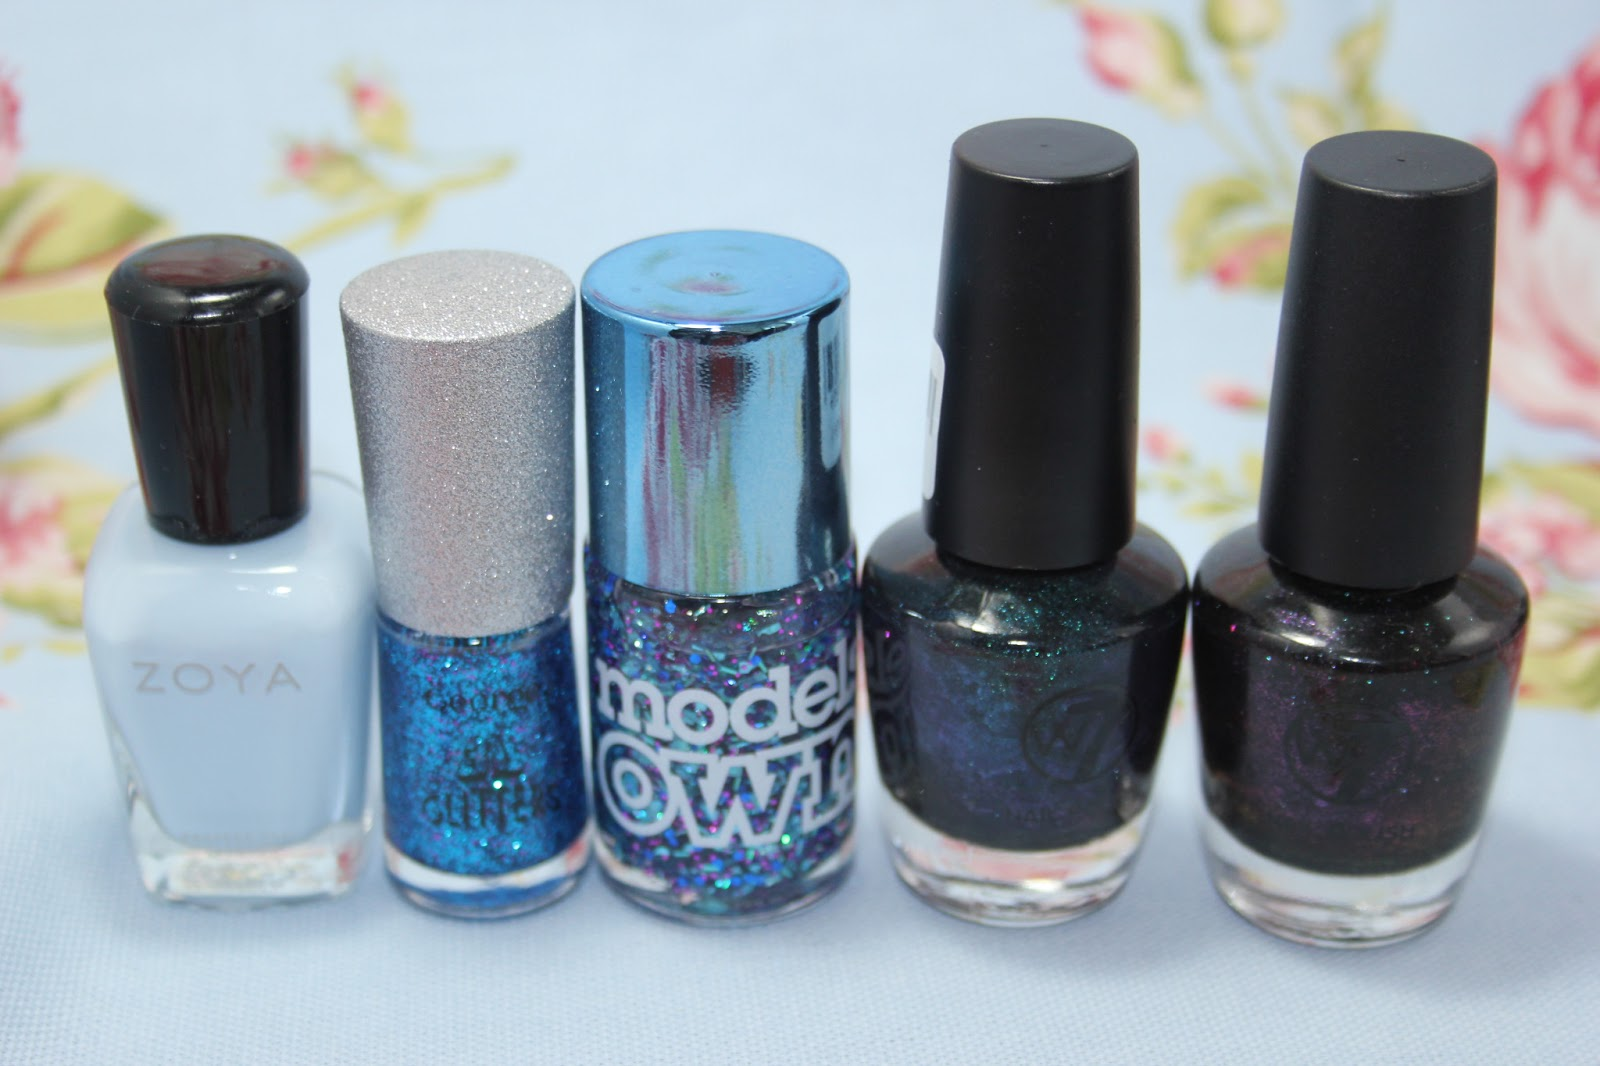 My nail polish collection - blue & teal - Love Leah